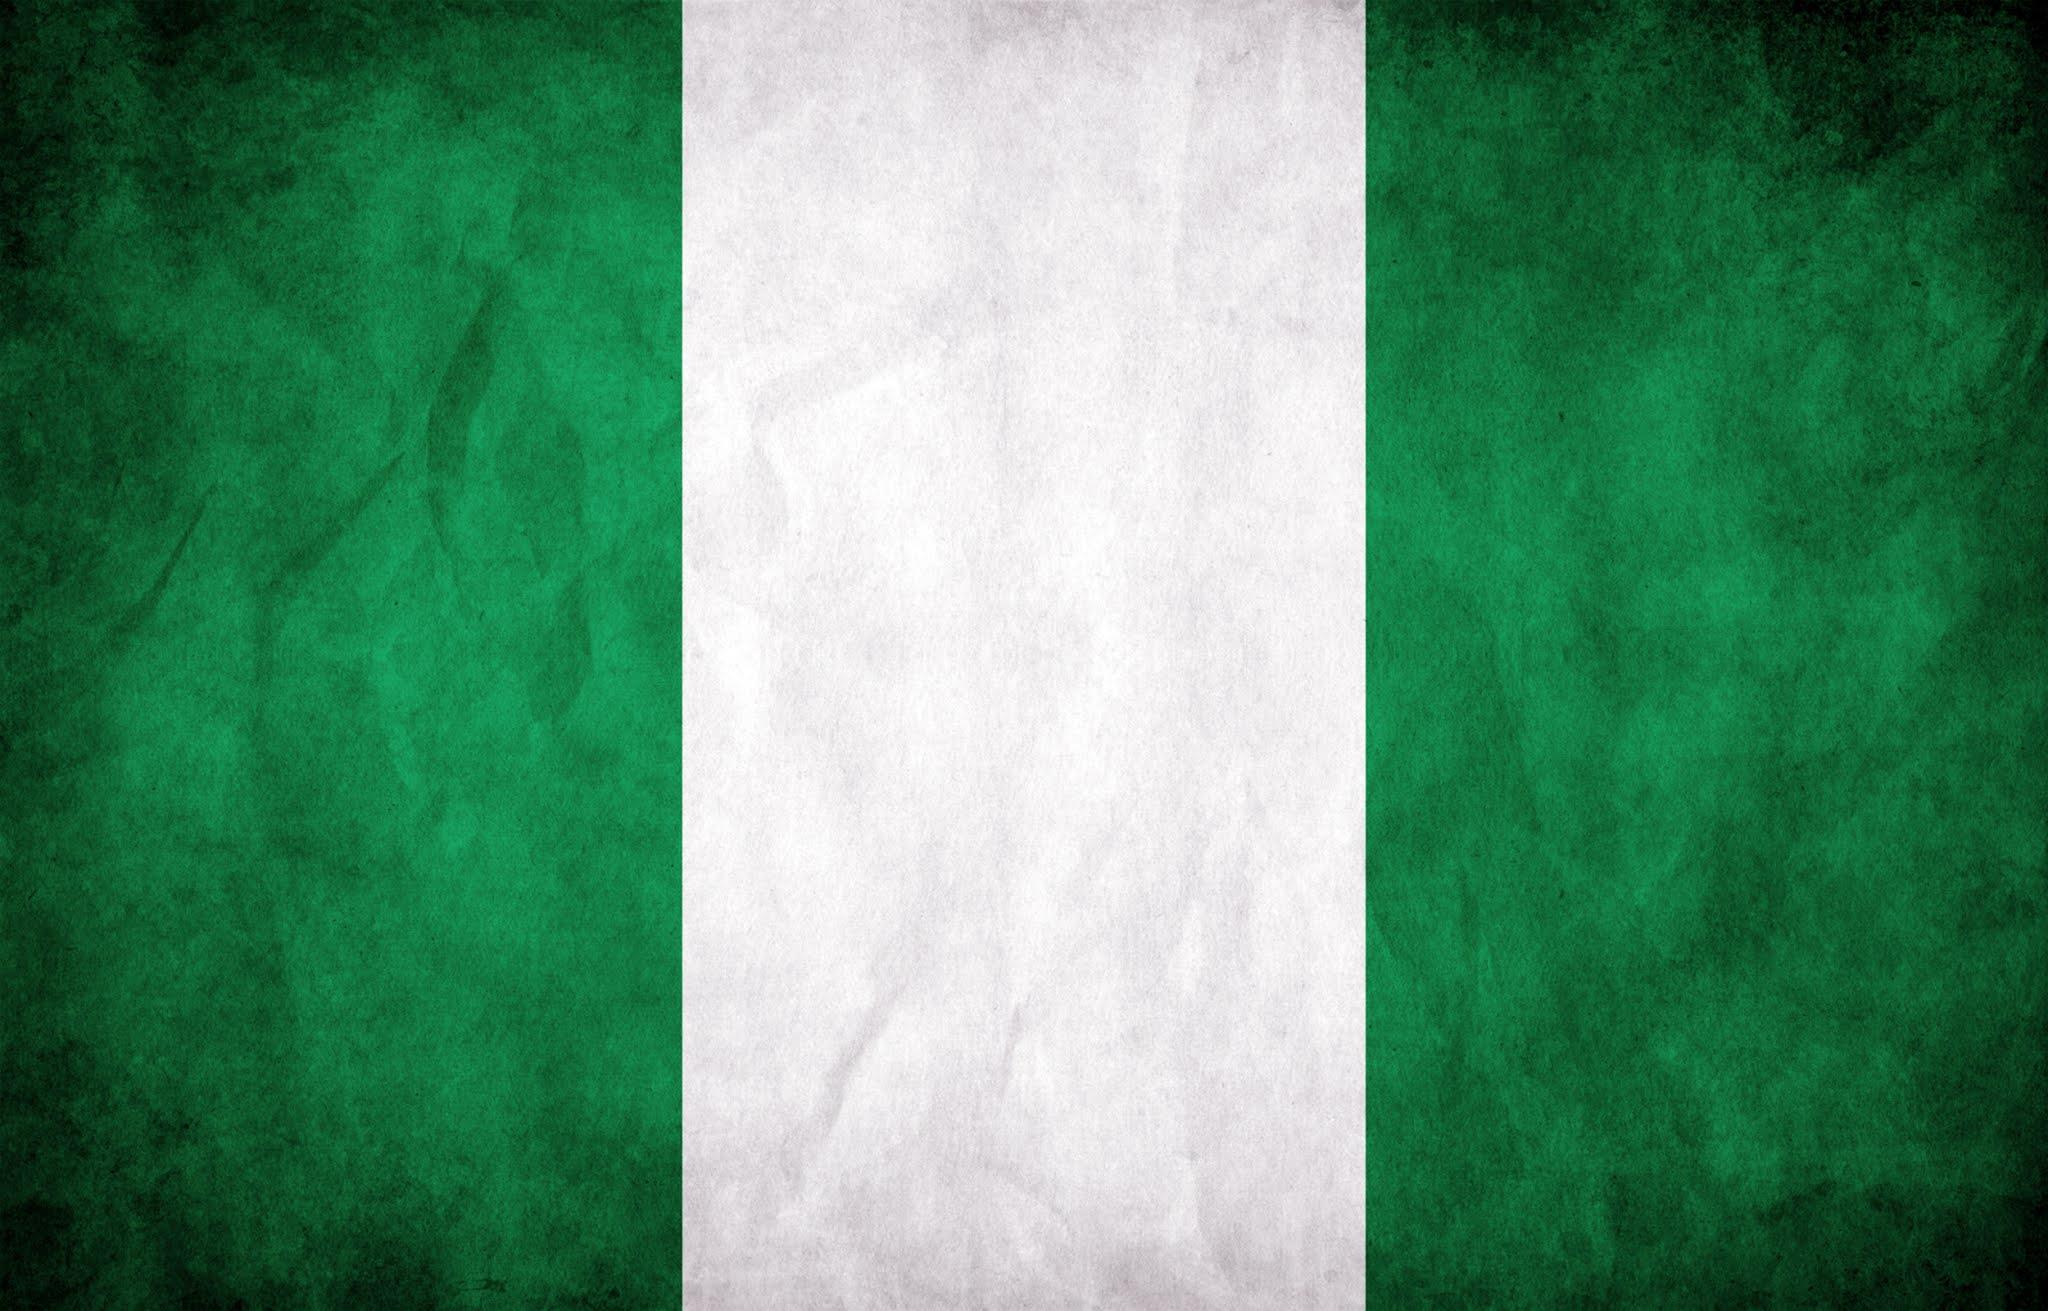 Download – flag of Nigeria HD Image